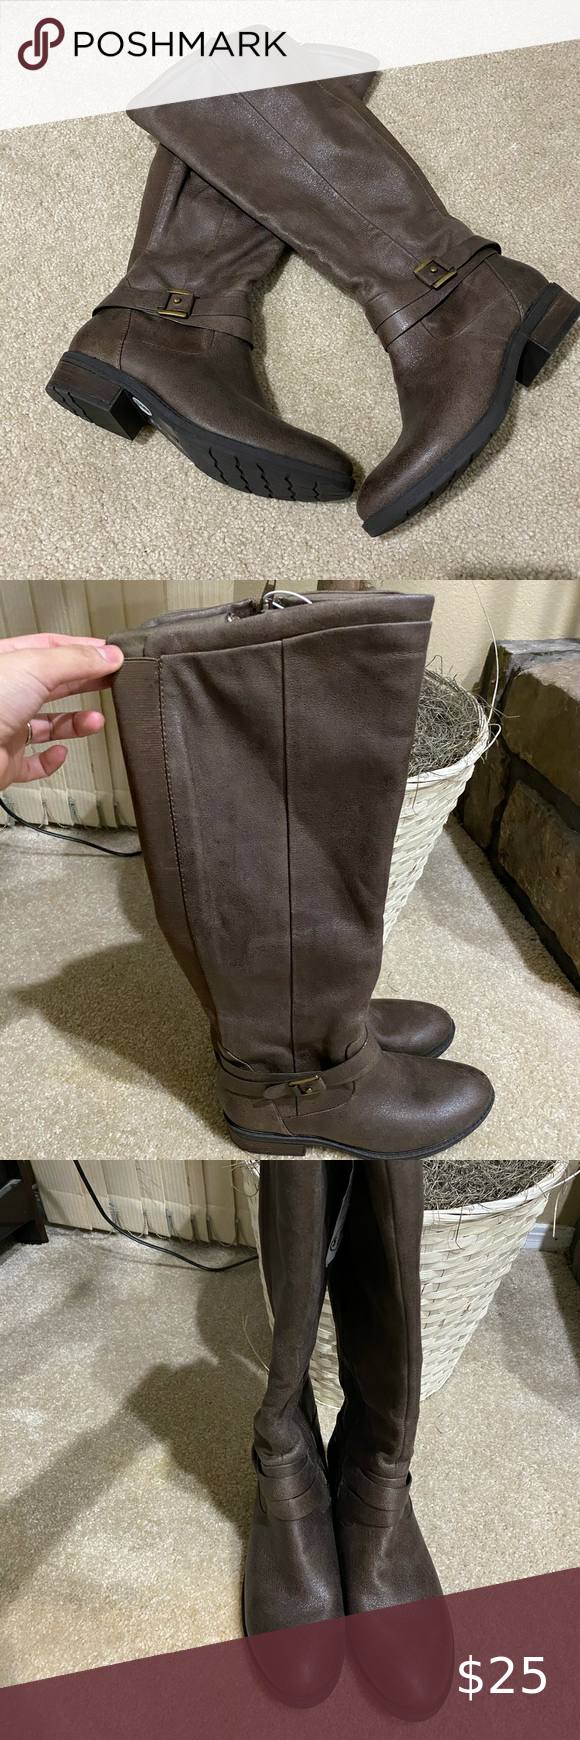 🌸NEW🌸 BARE TRAPS Wide Calf boots in